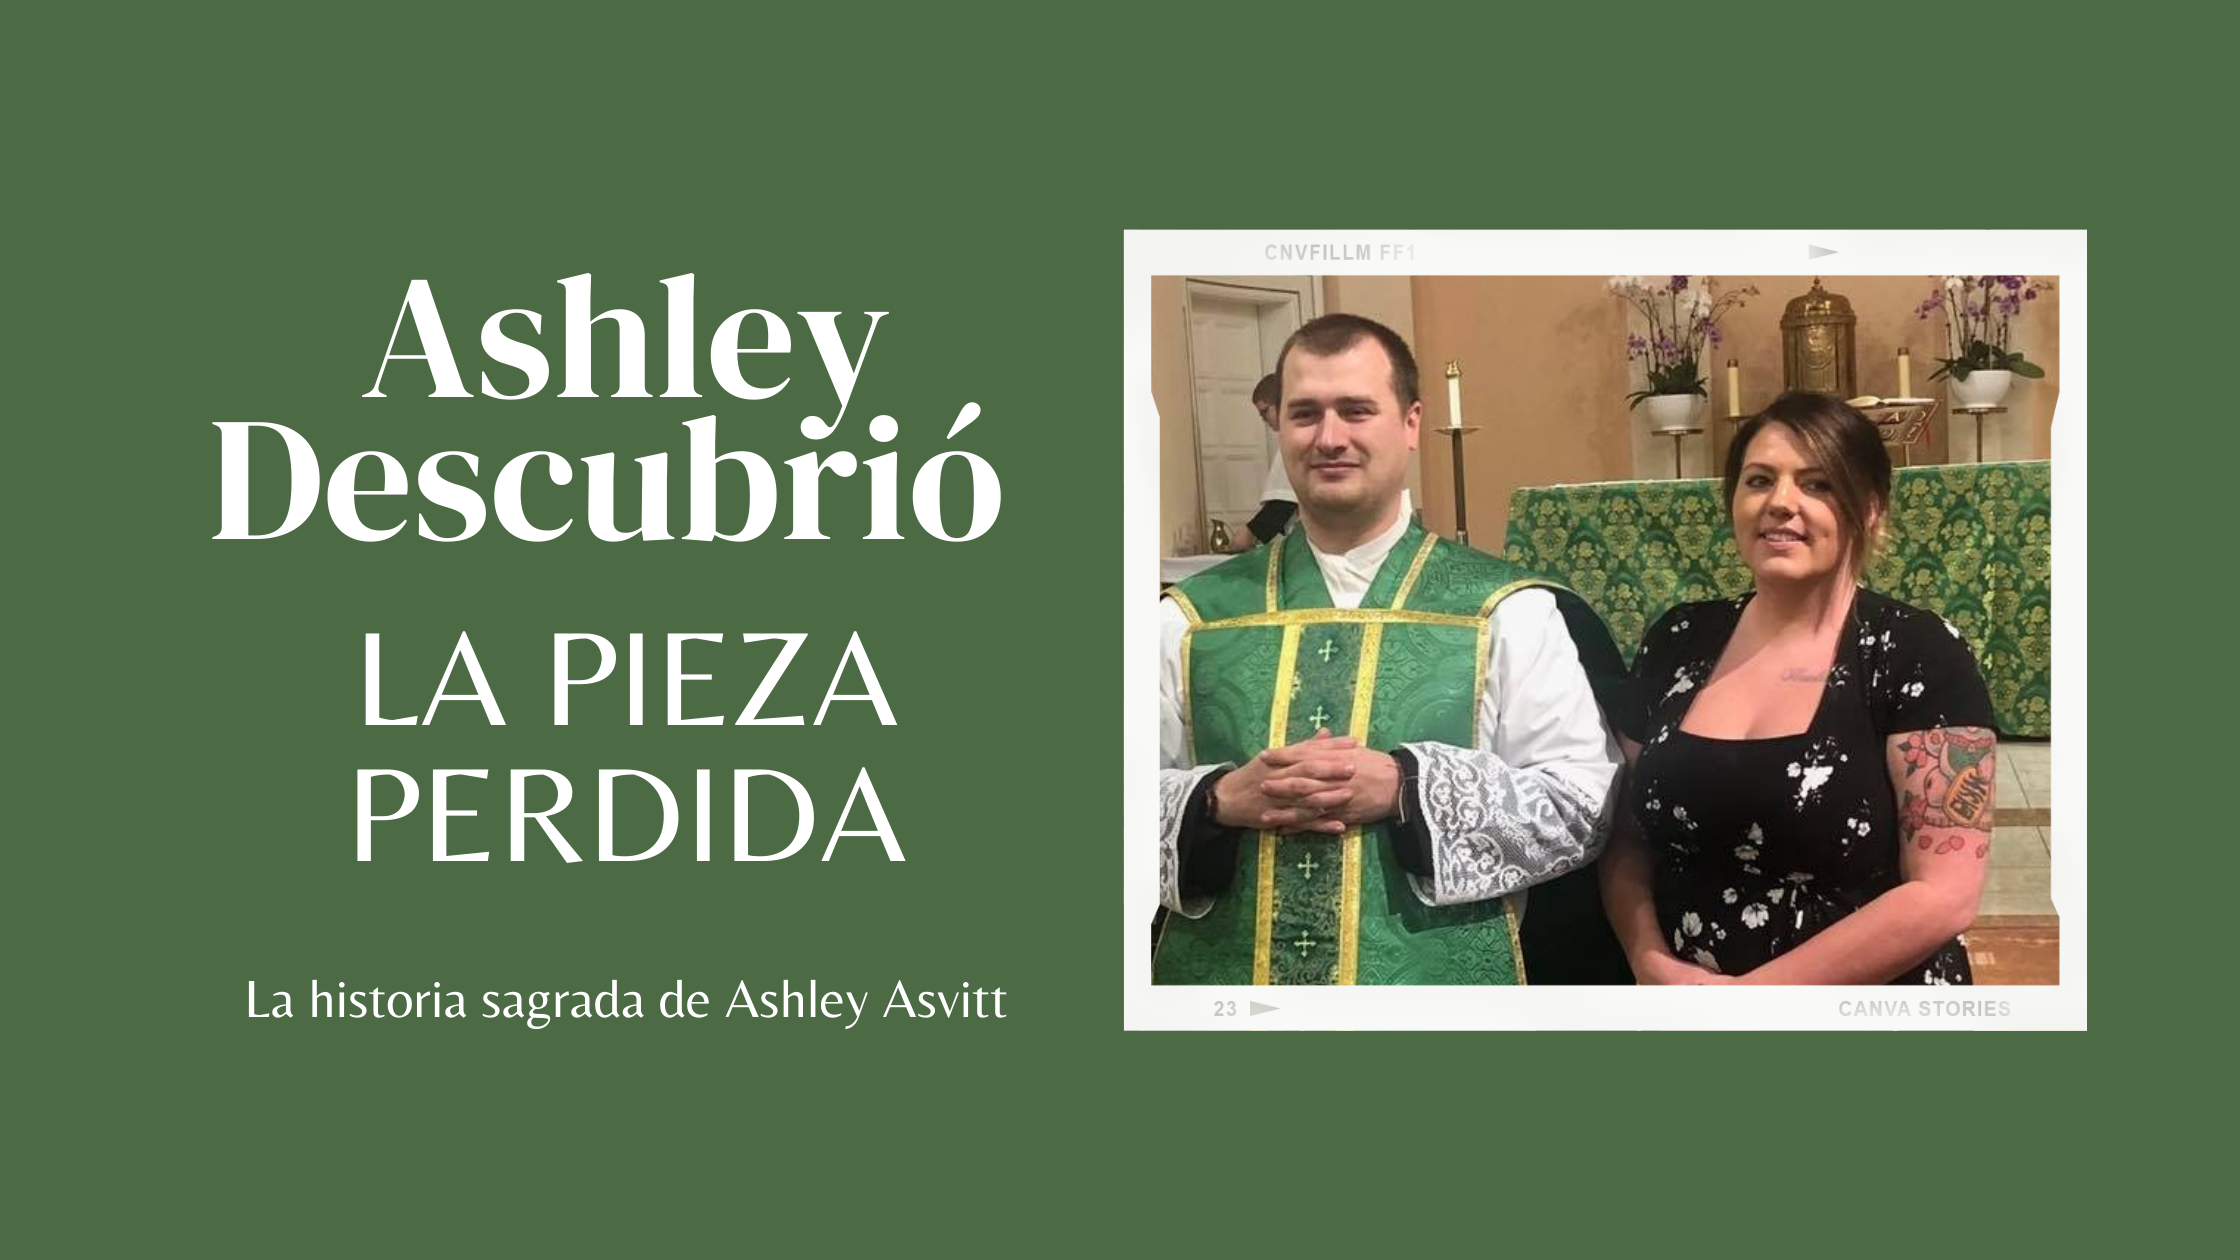 Ashley Discovered Blog (espanol)